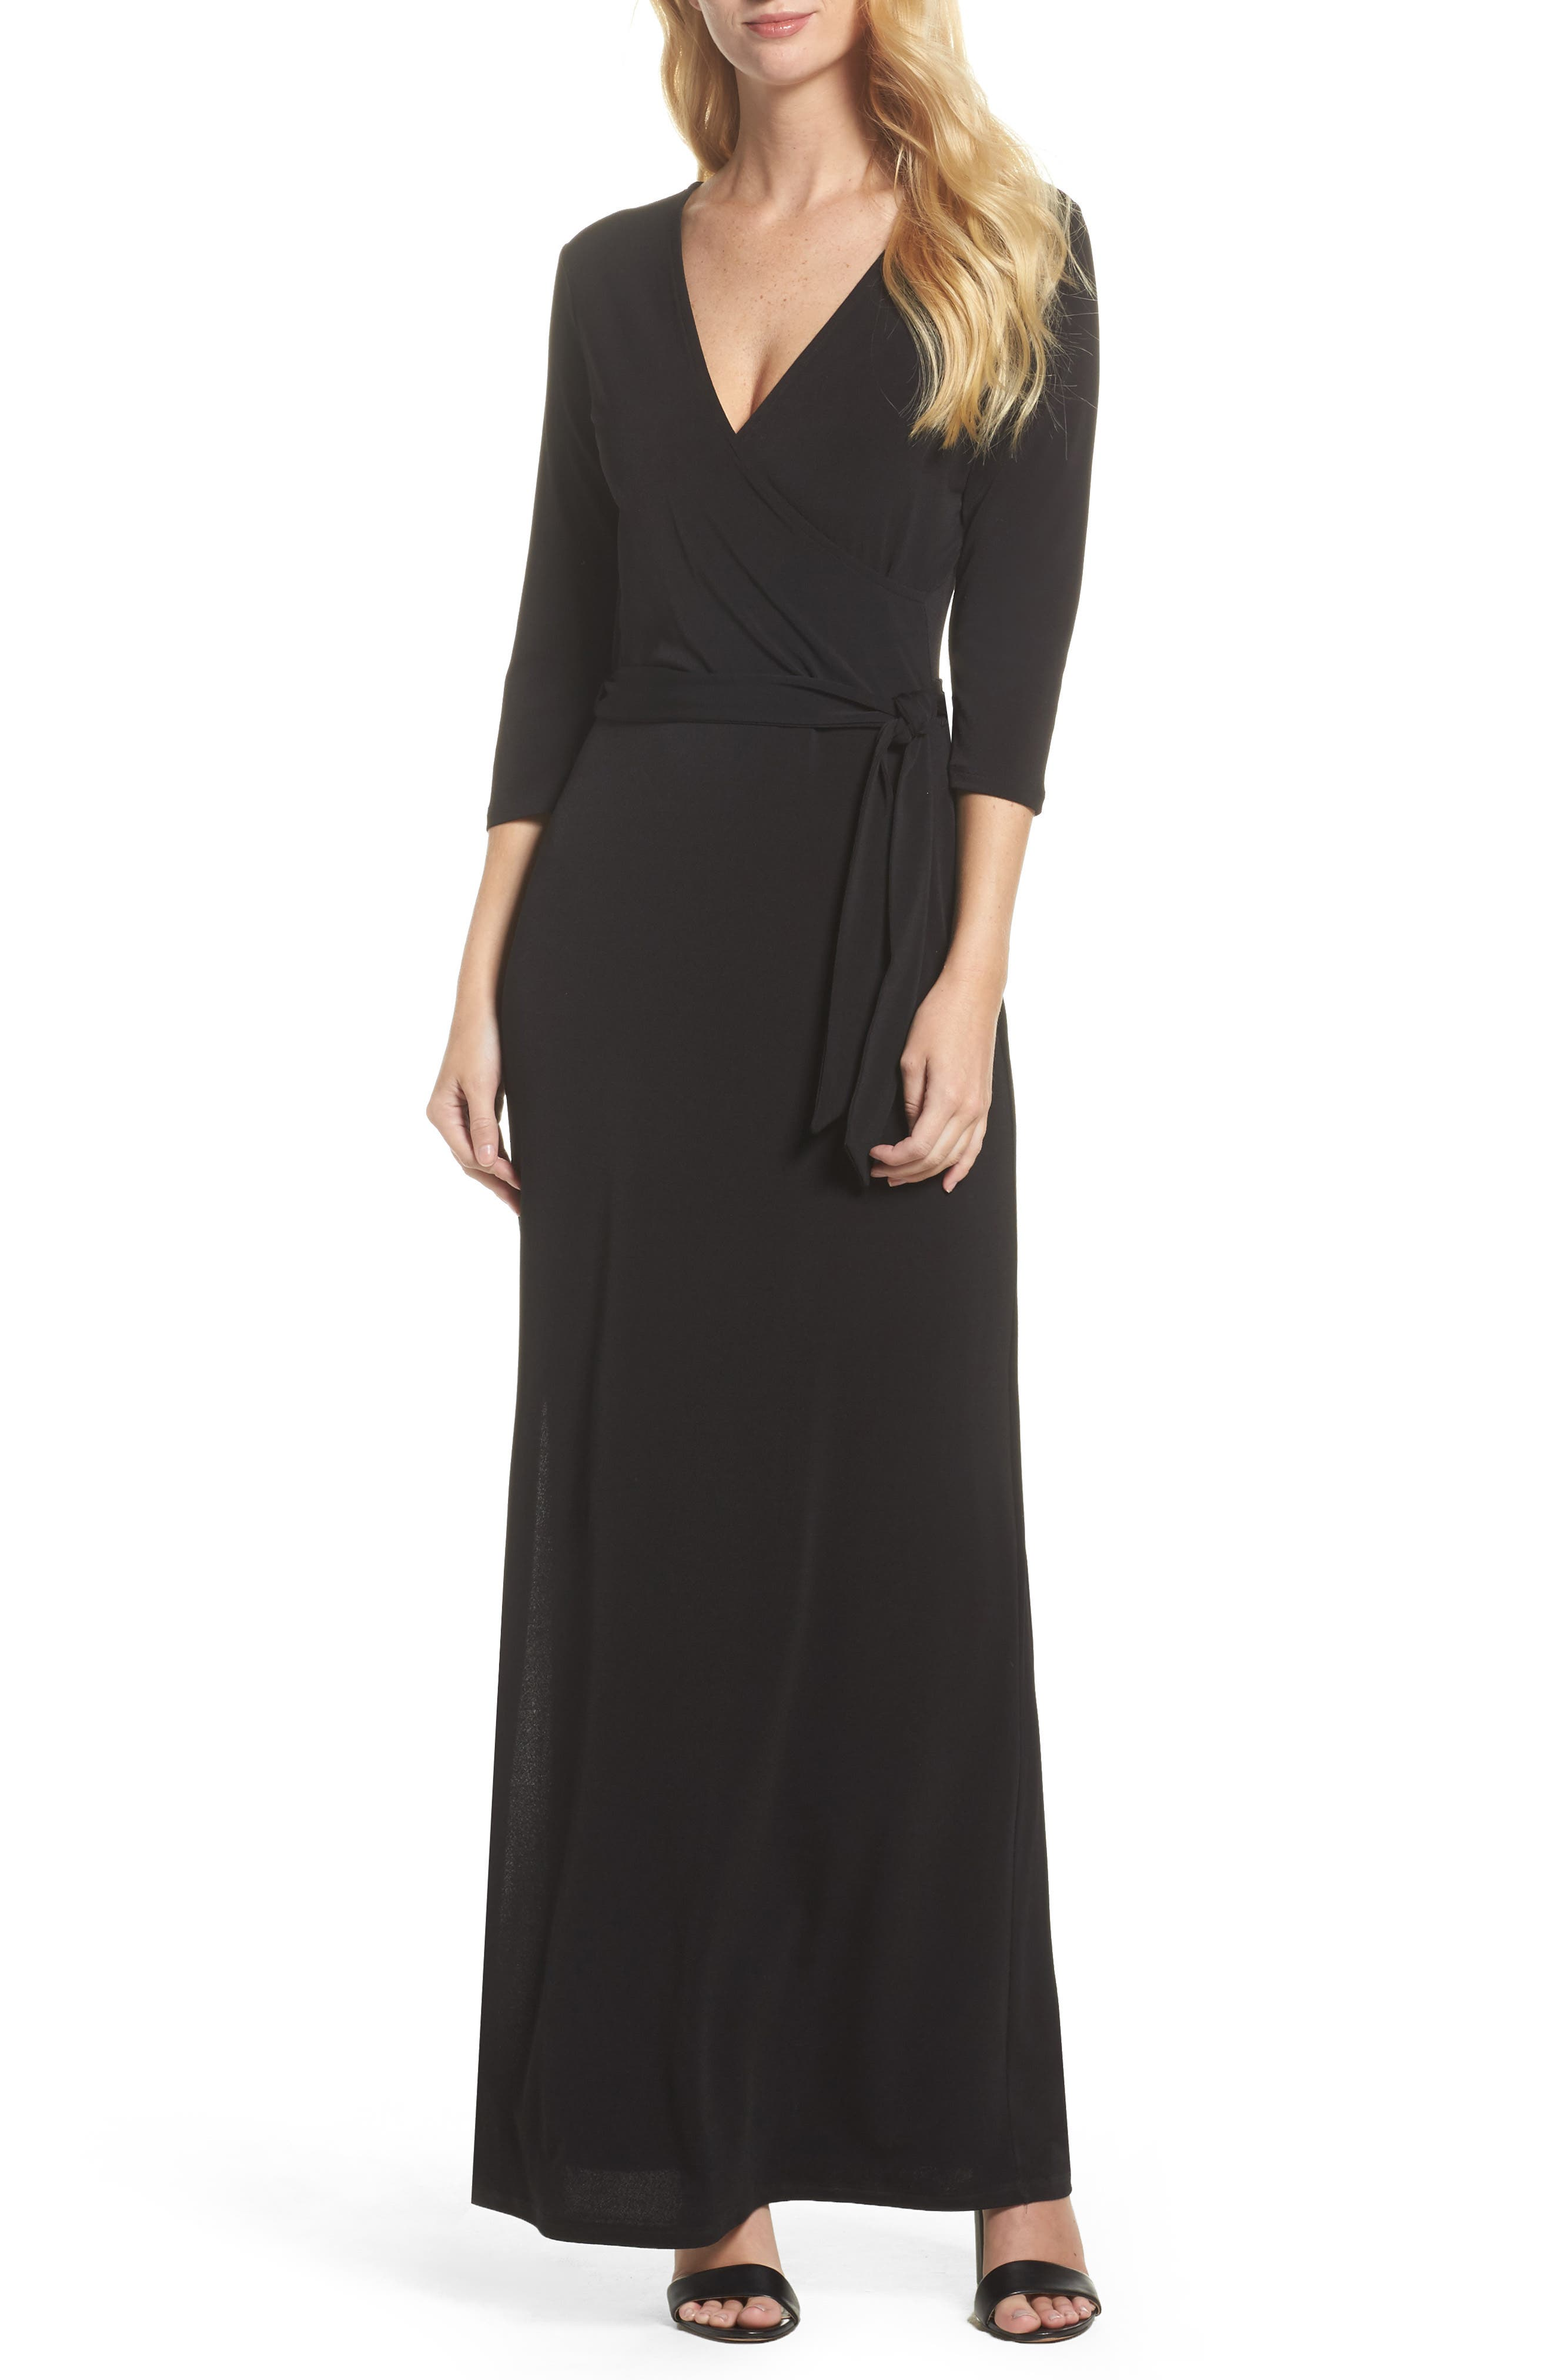 Leota Perfect Wrap Maxi Dress, Black